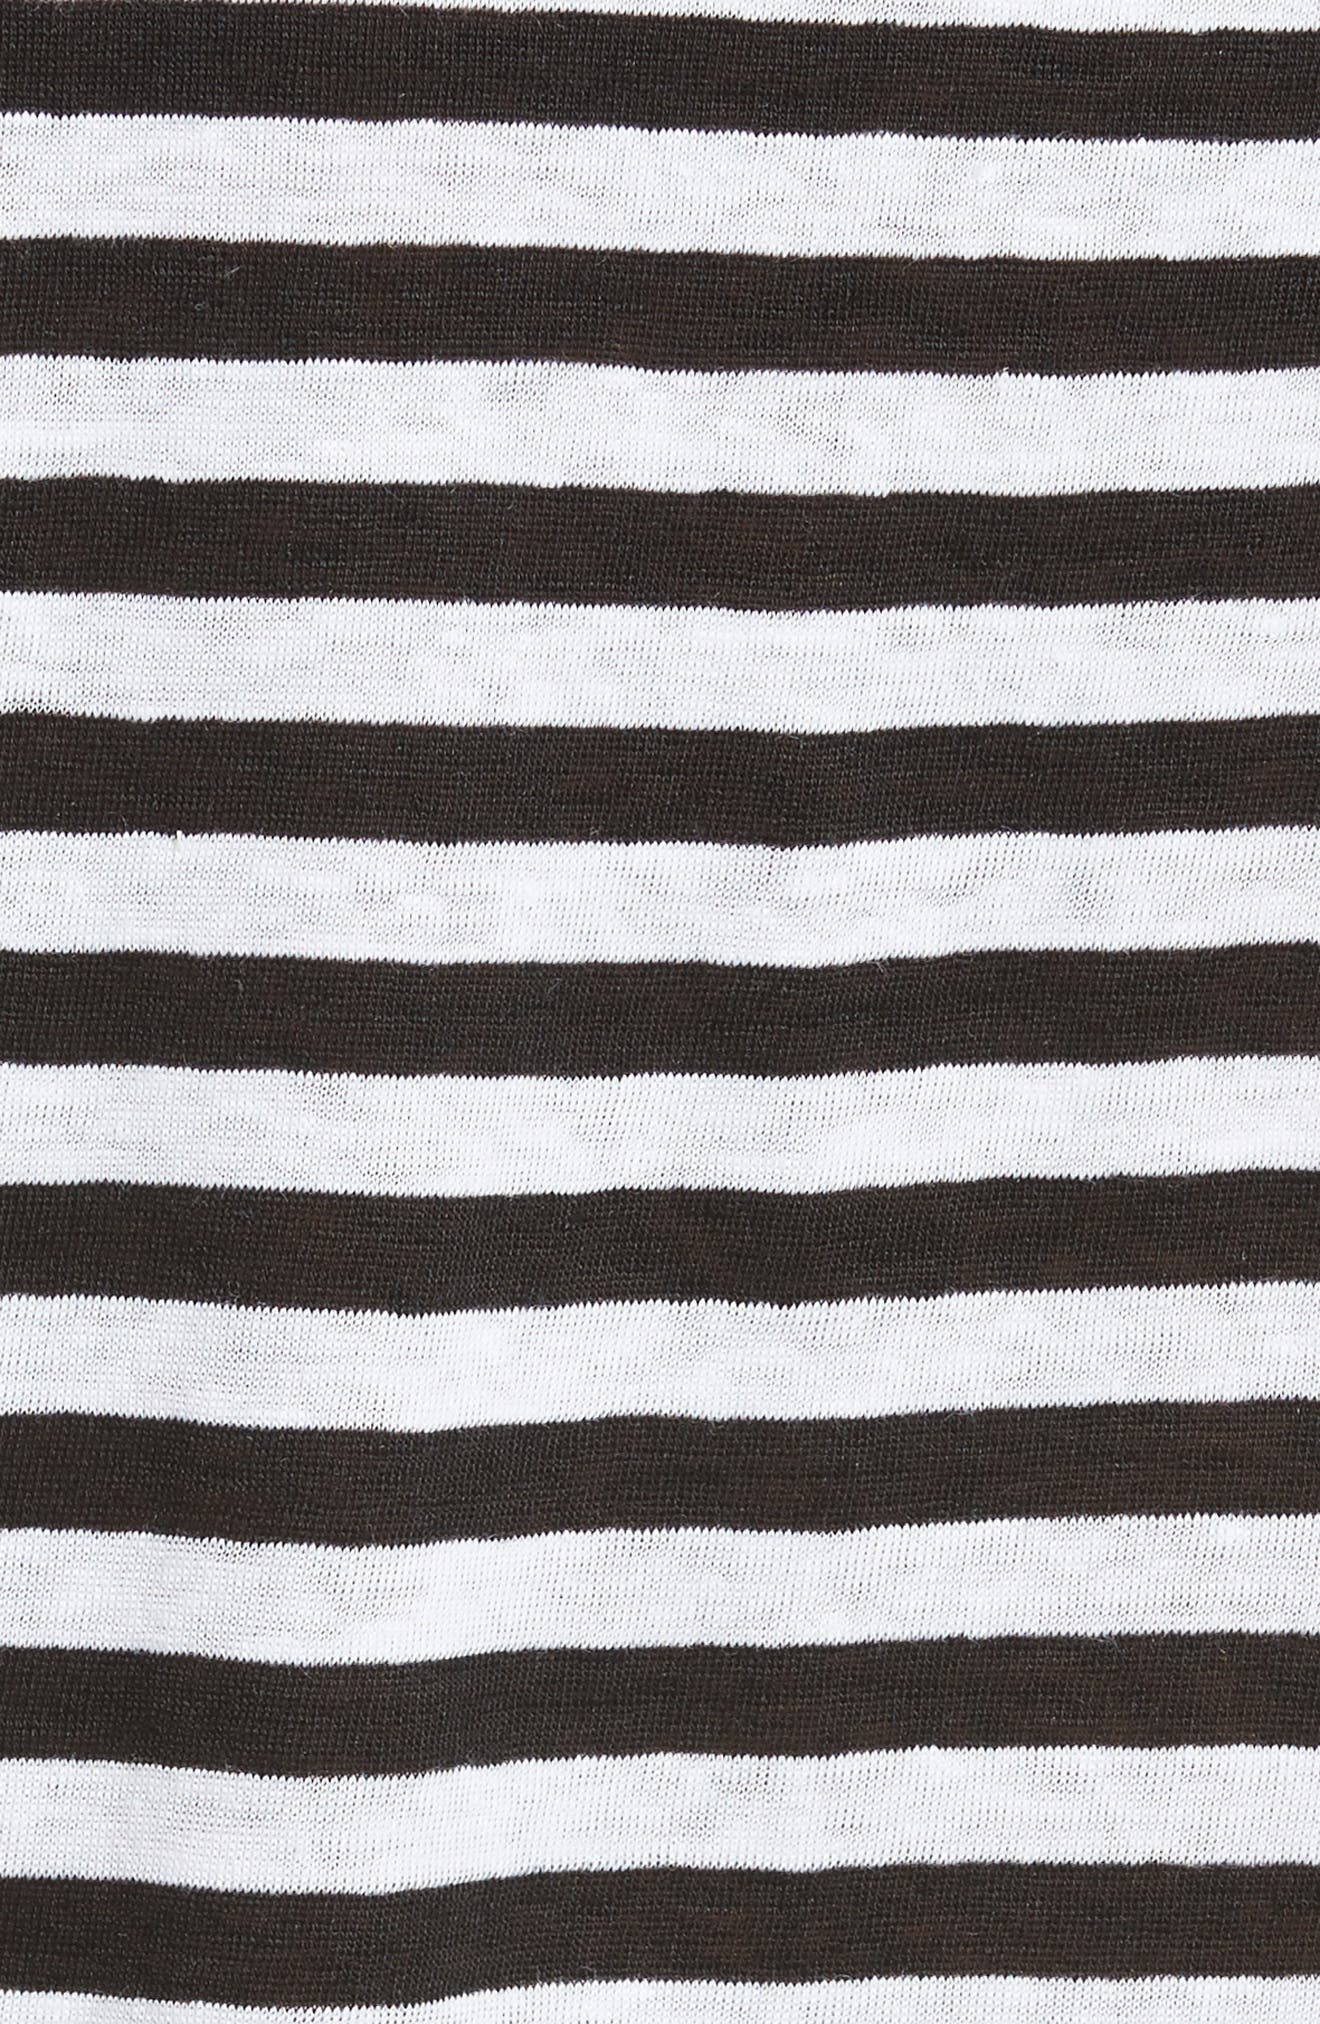 Stripe Crew Tee,                             Alternate thumbnail 7, color,                             Noir Multi Wide Stripe